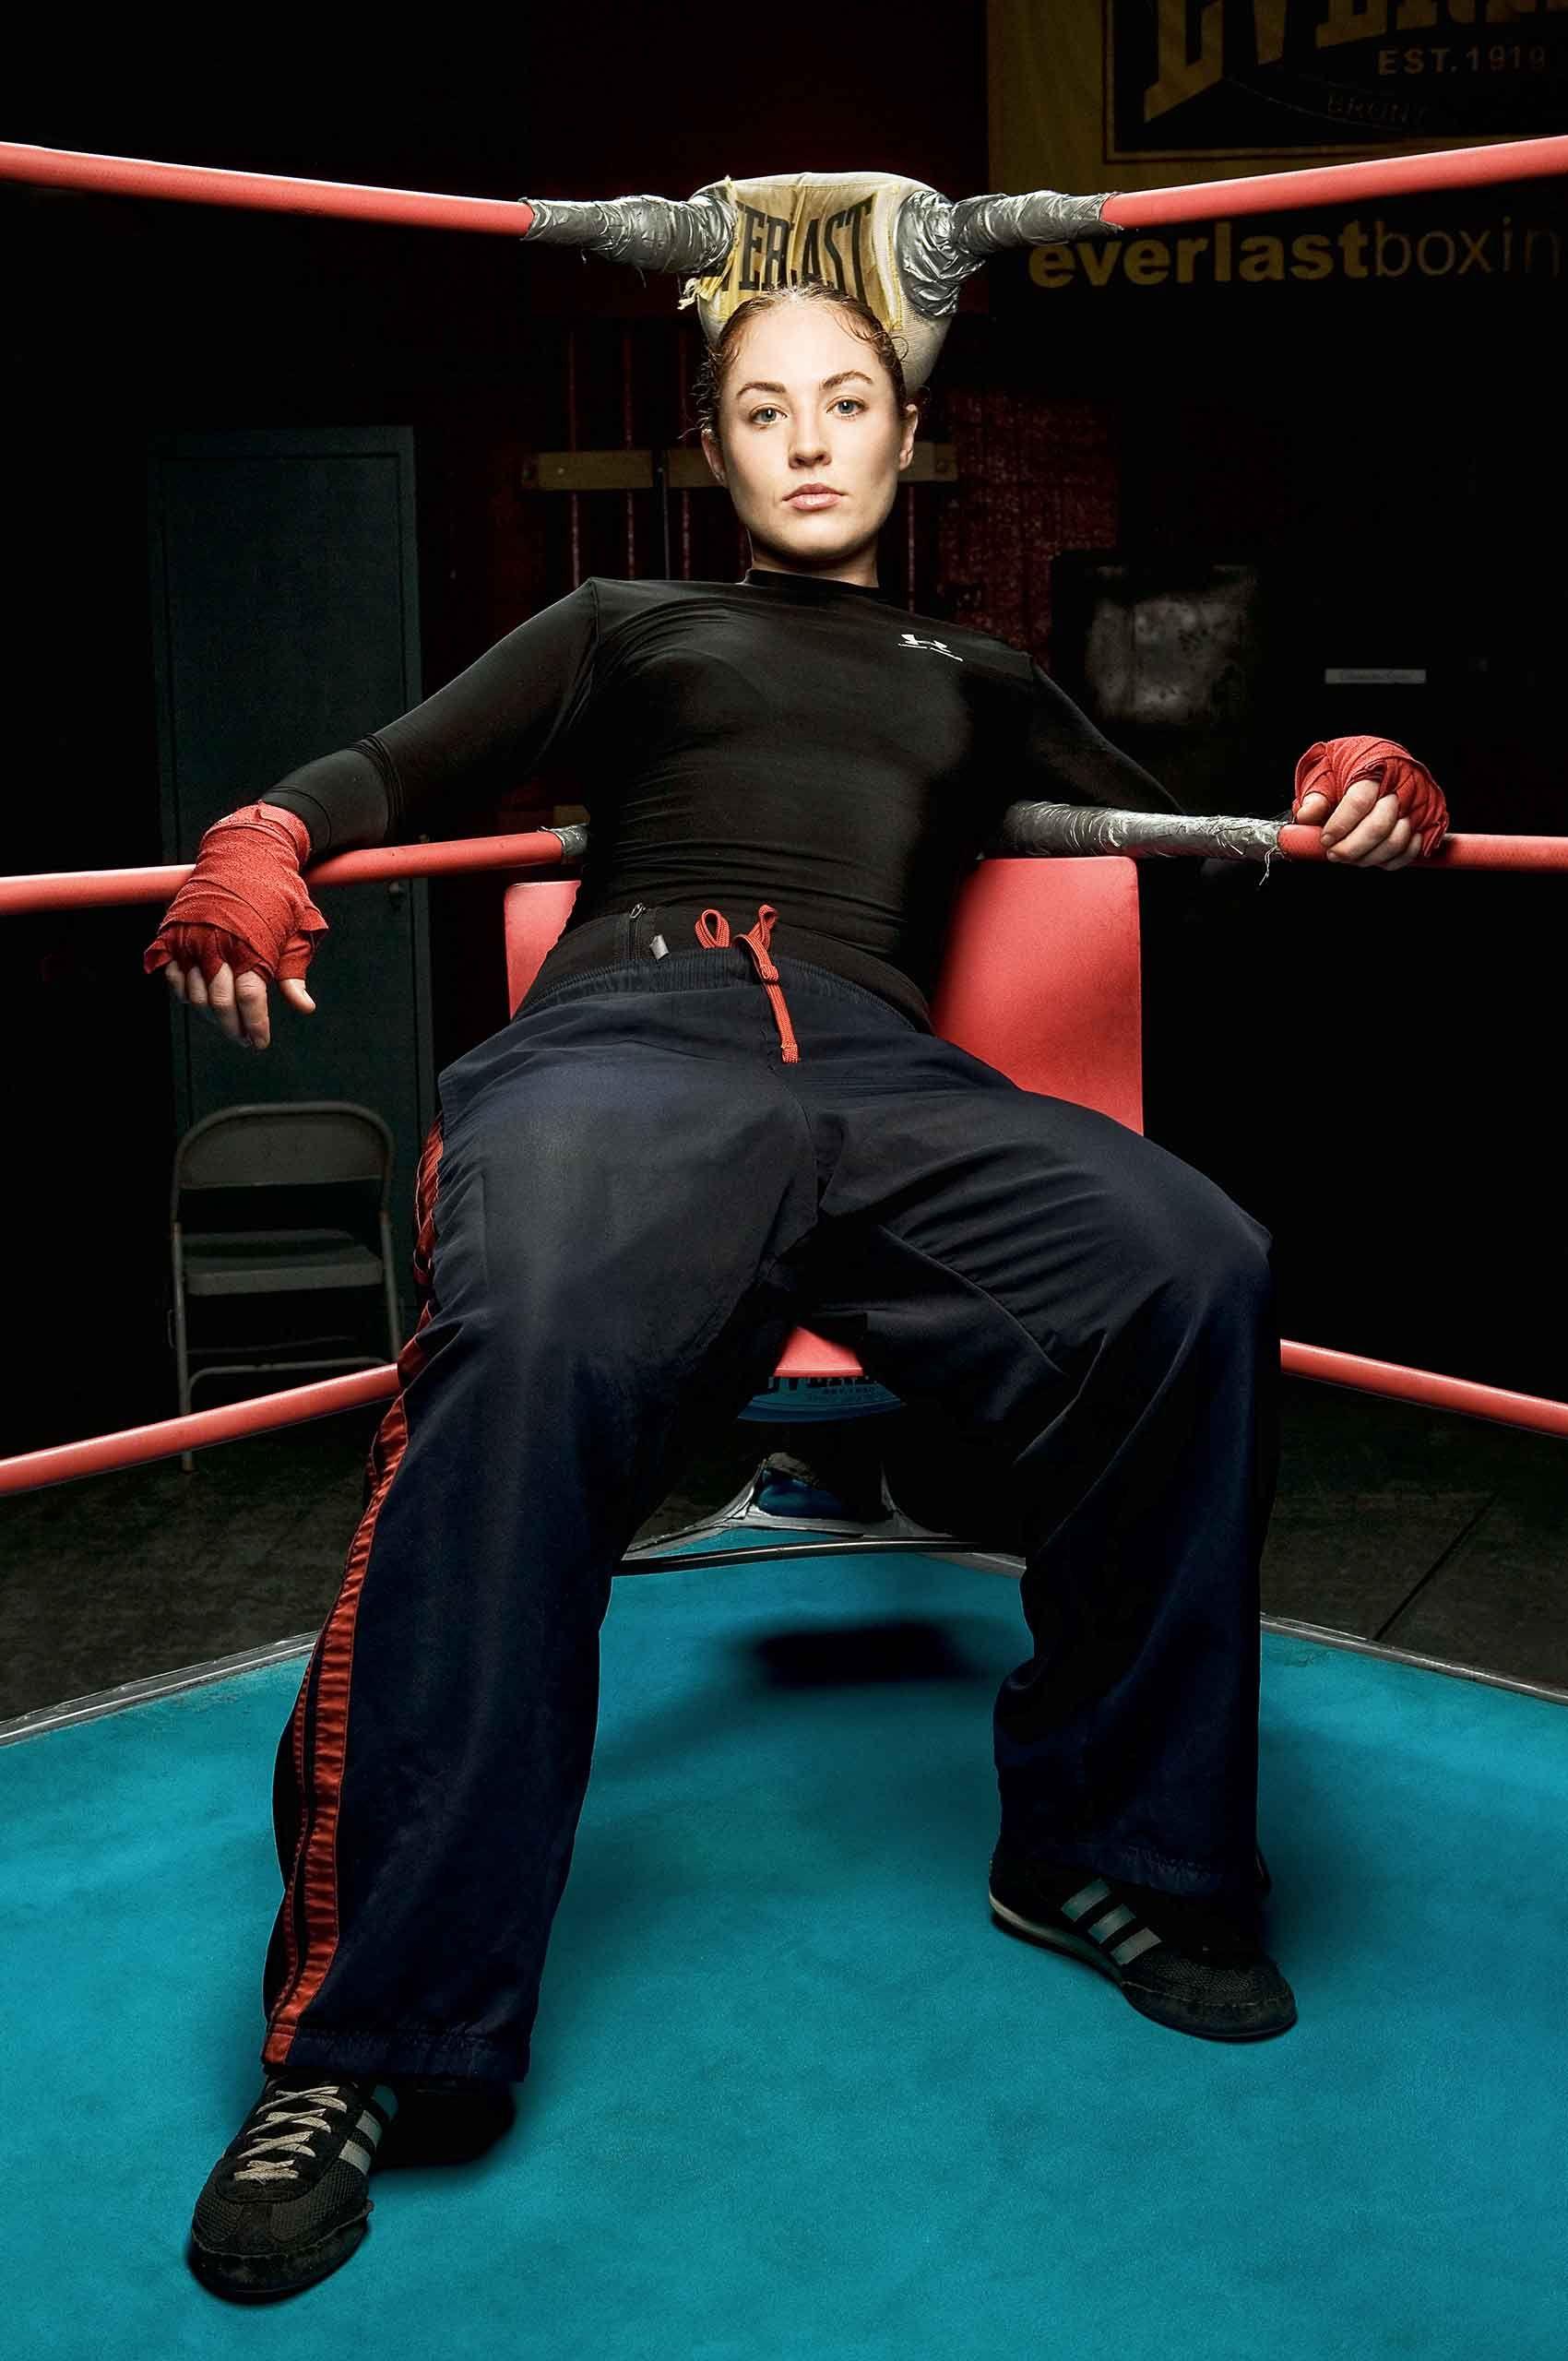 Femaleboxer-at-gleasons-brooklyn-by-HenrikOlundPhotography.jpg